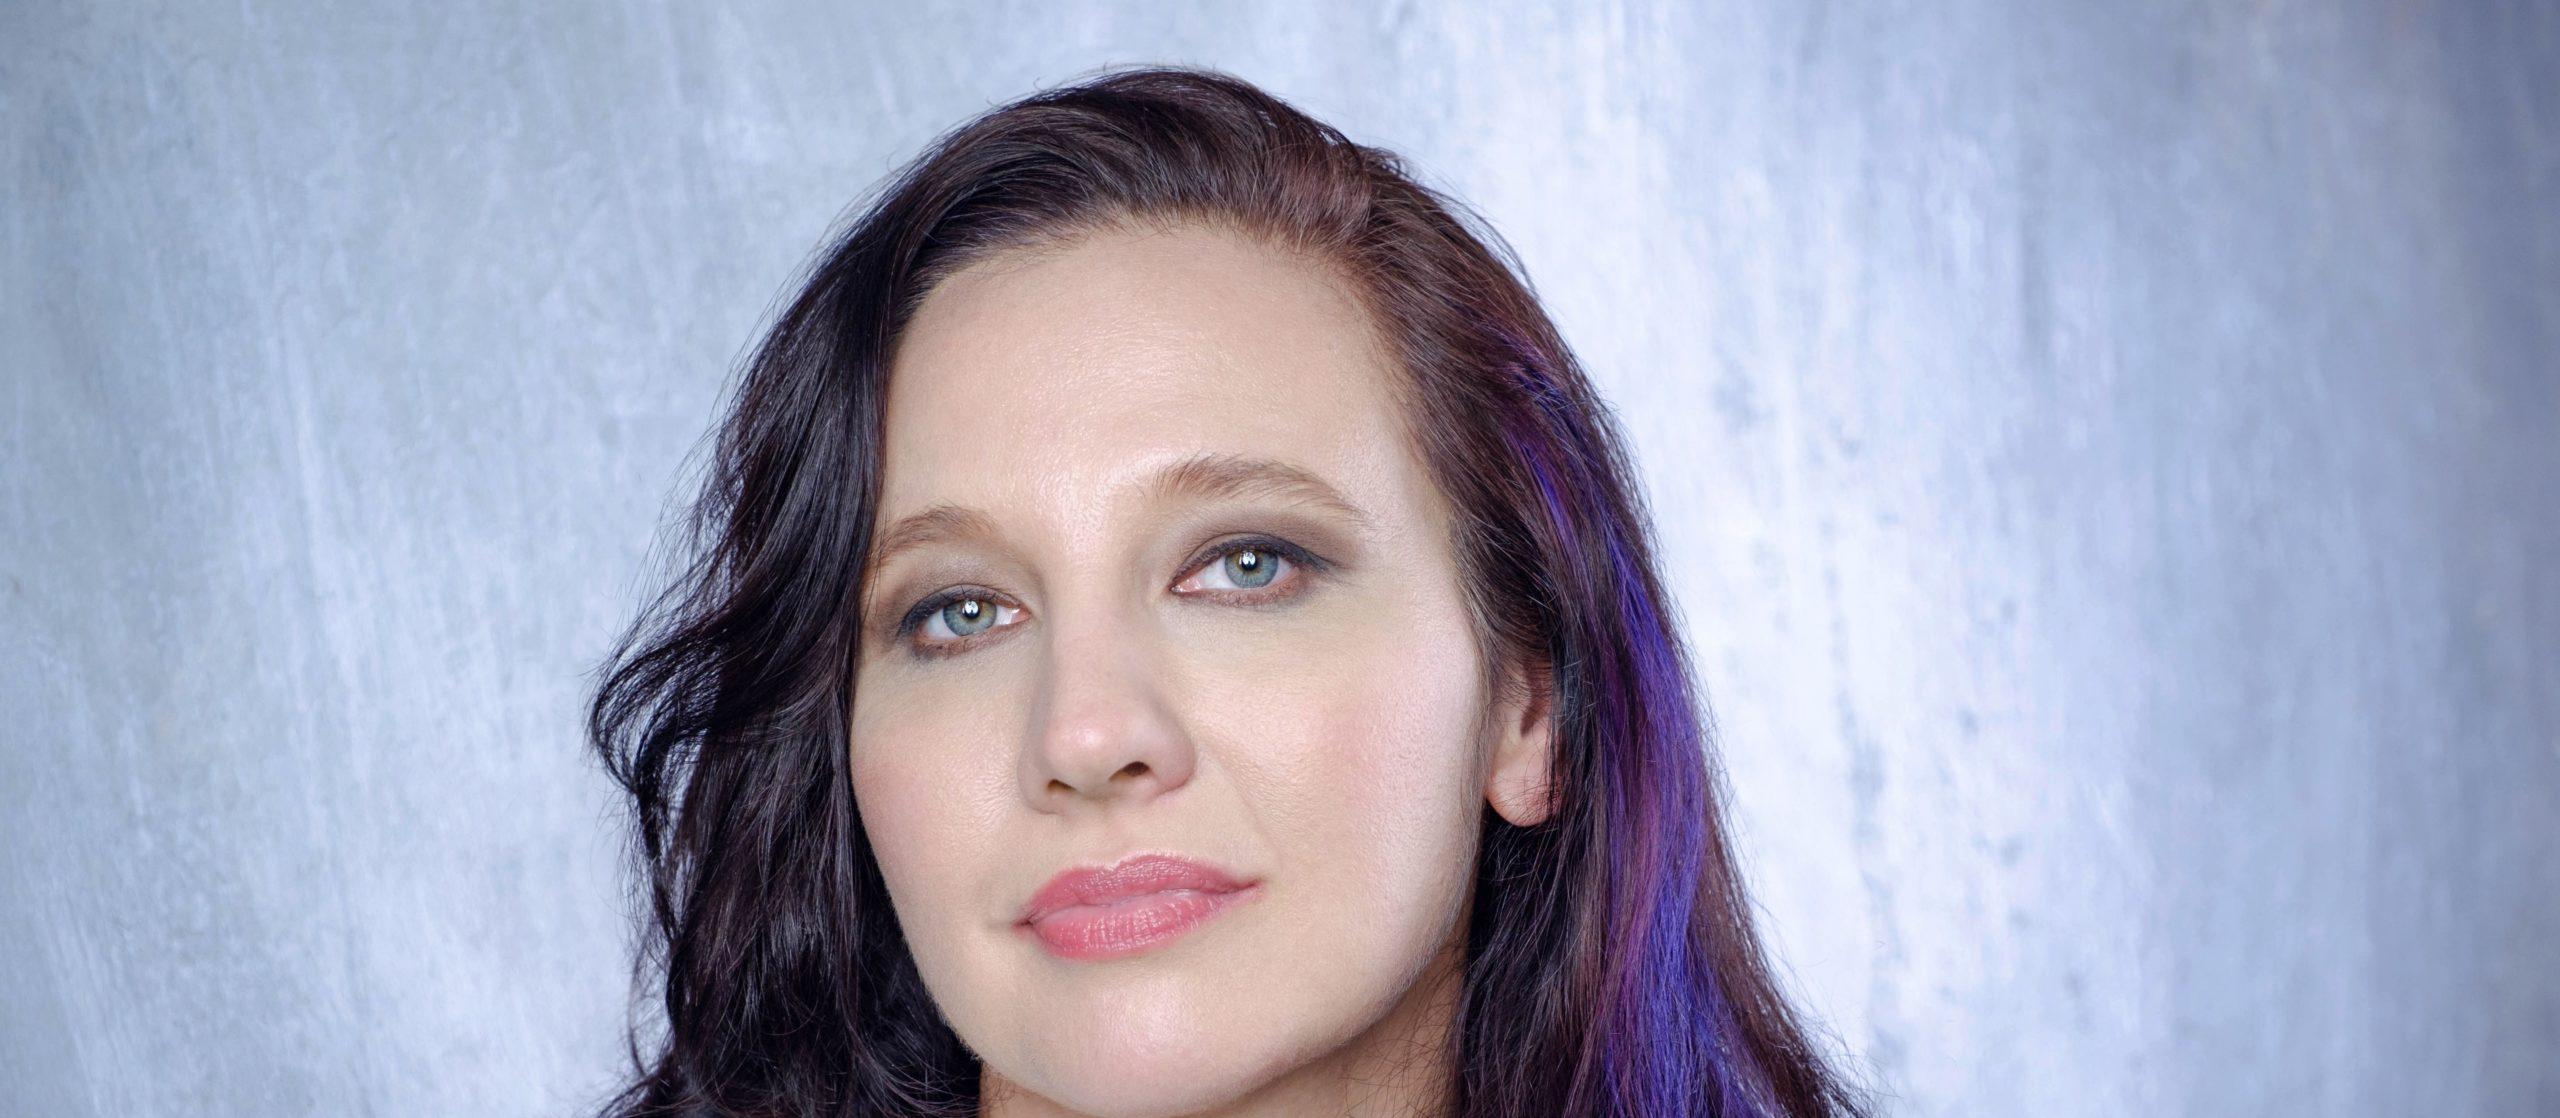 Natalie Nicole Gilbert Presents New Album 'Don't Blink'